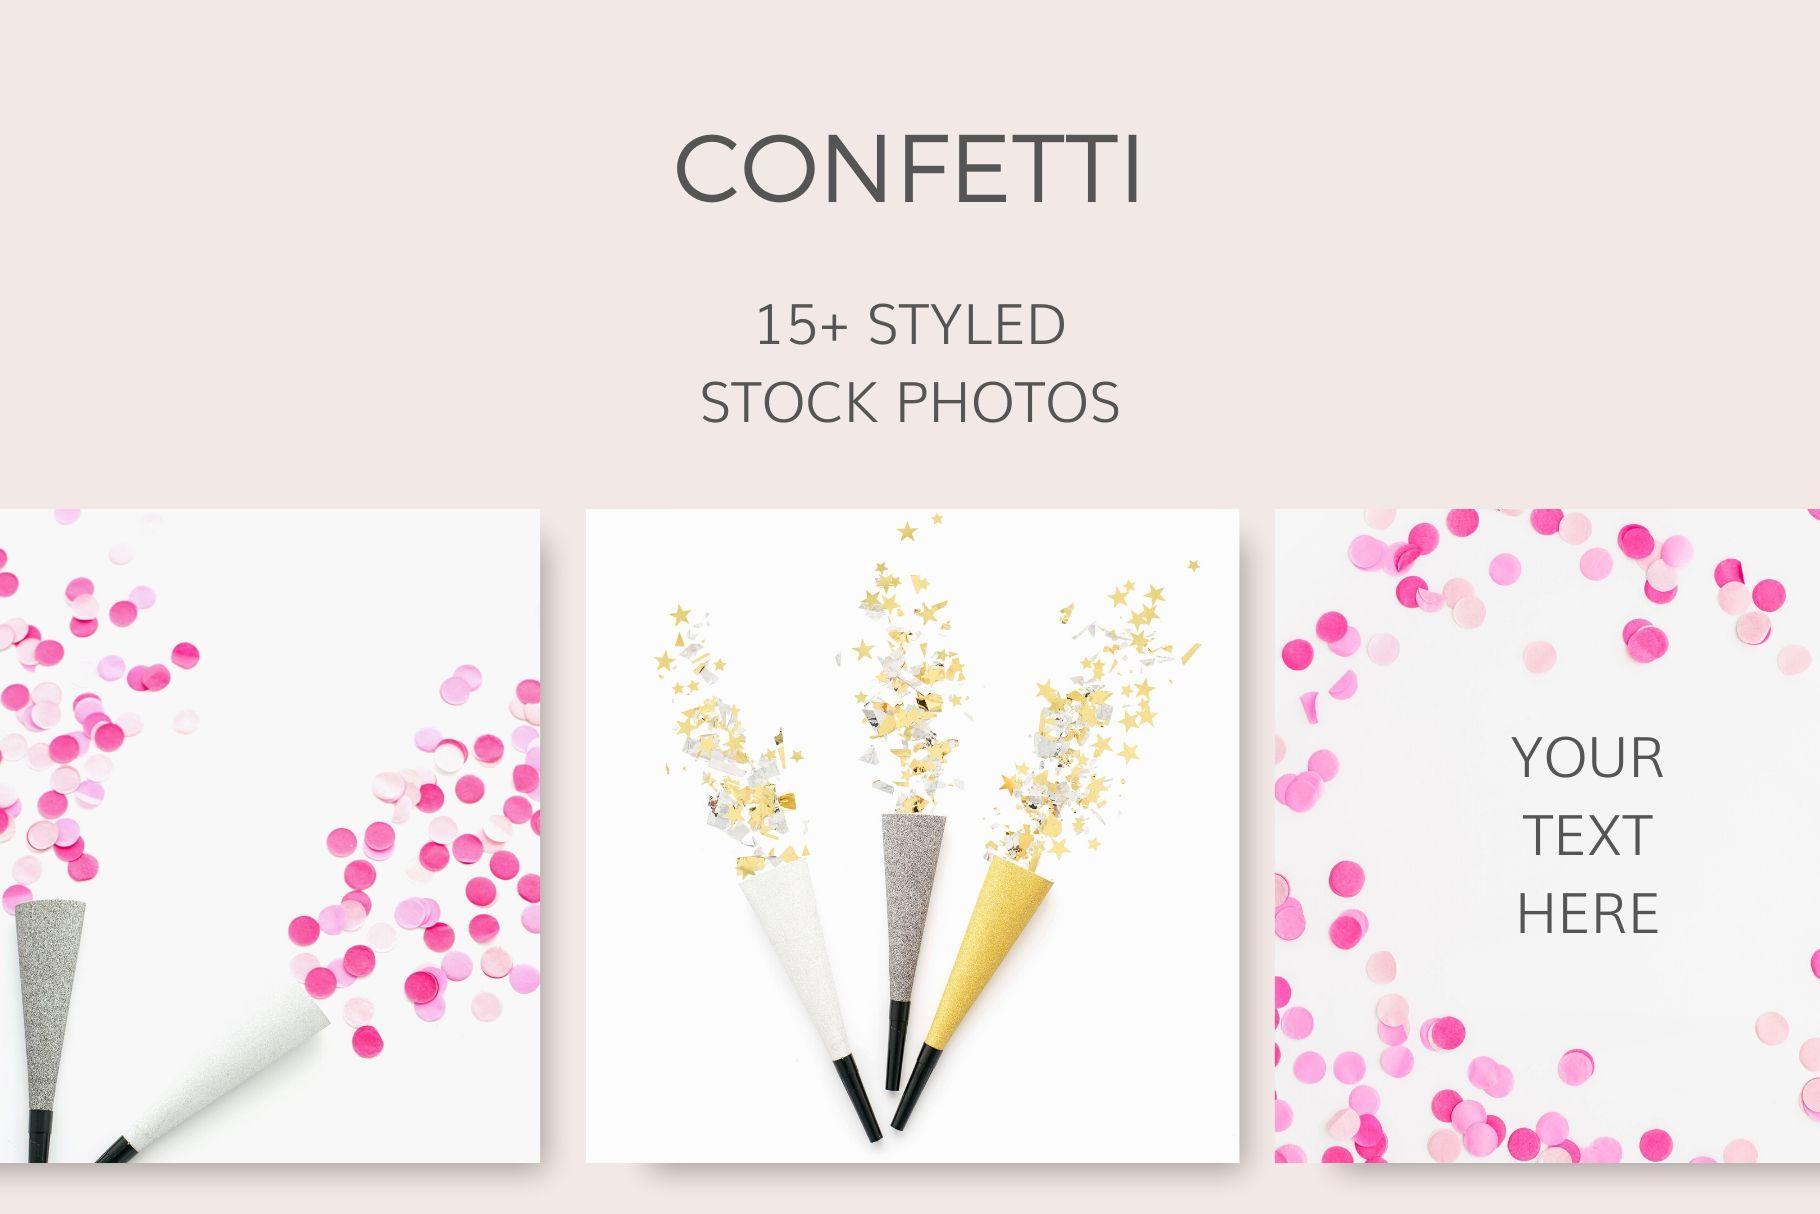 Confetti Styled Stock Photos